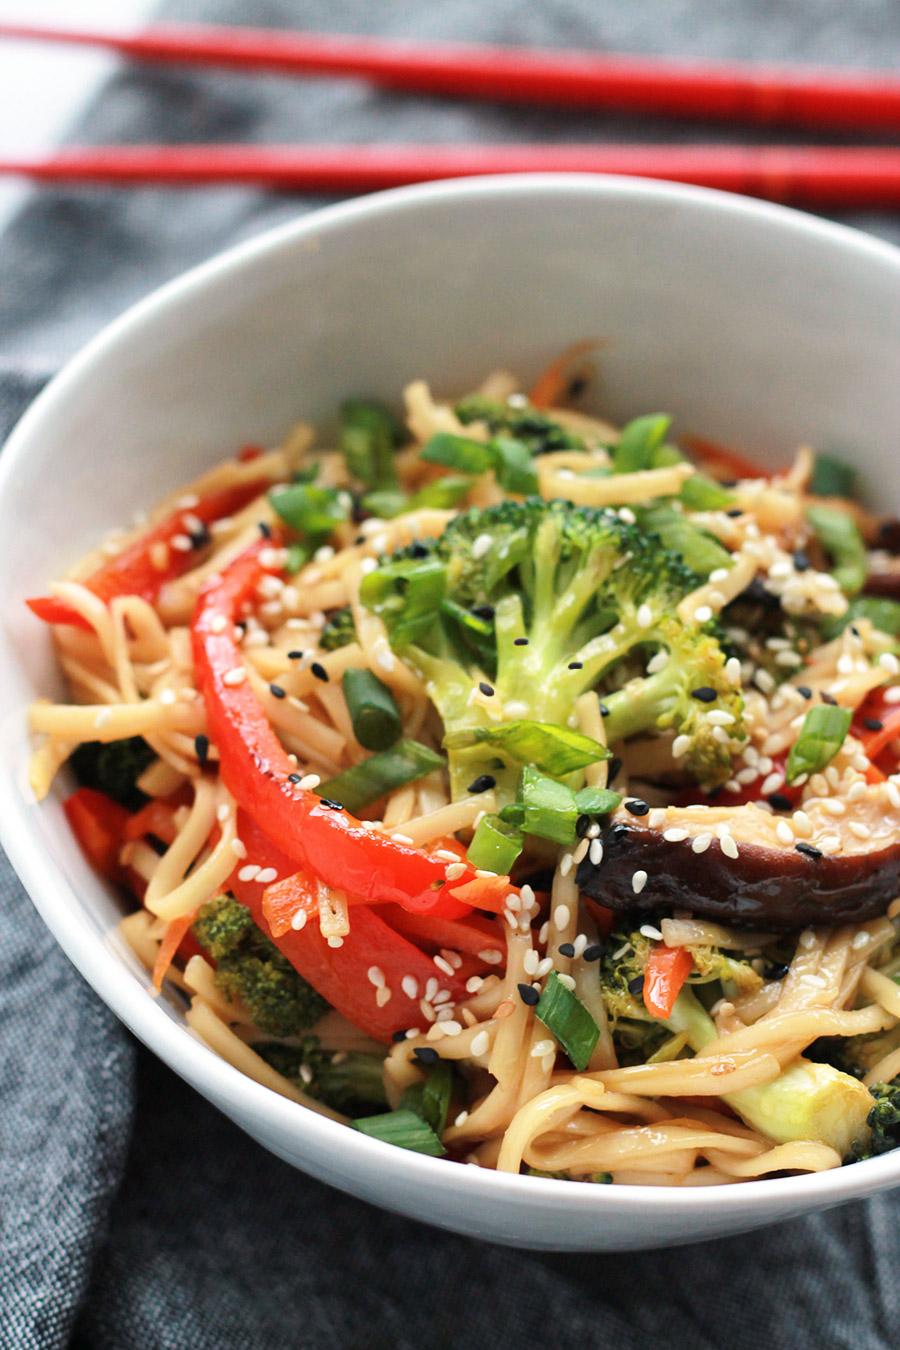 Bowl of tasty Spicy Teriyaki Ramen with Sriracha.